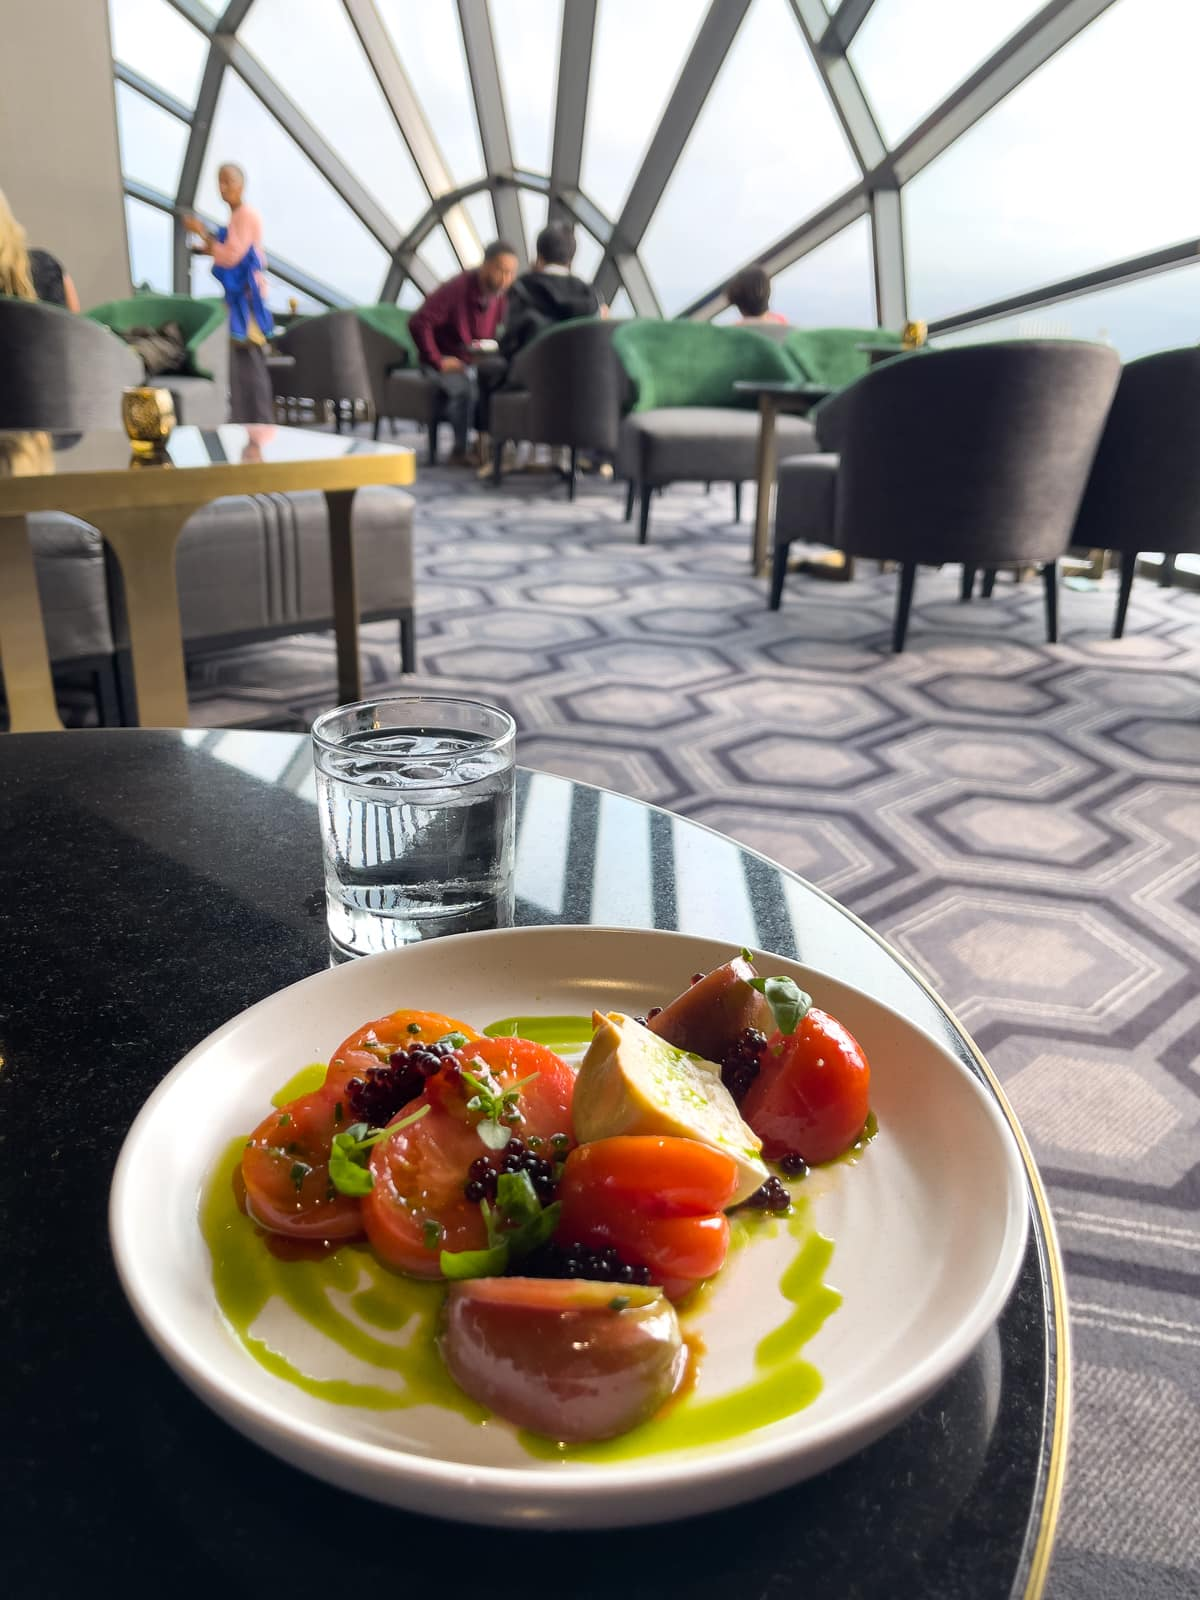 Tomato burrata salad at The View Lounge, San Francisco